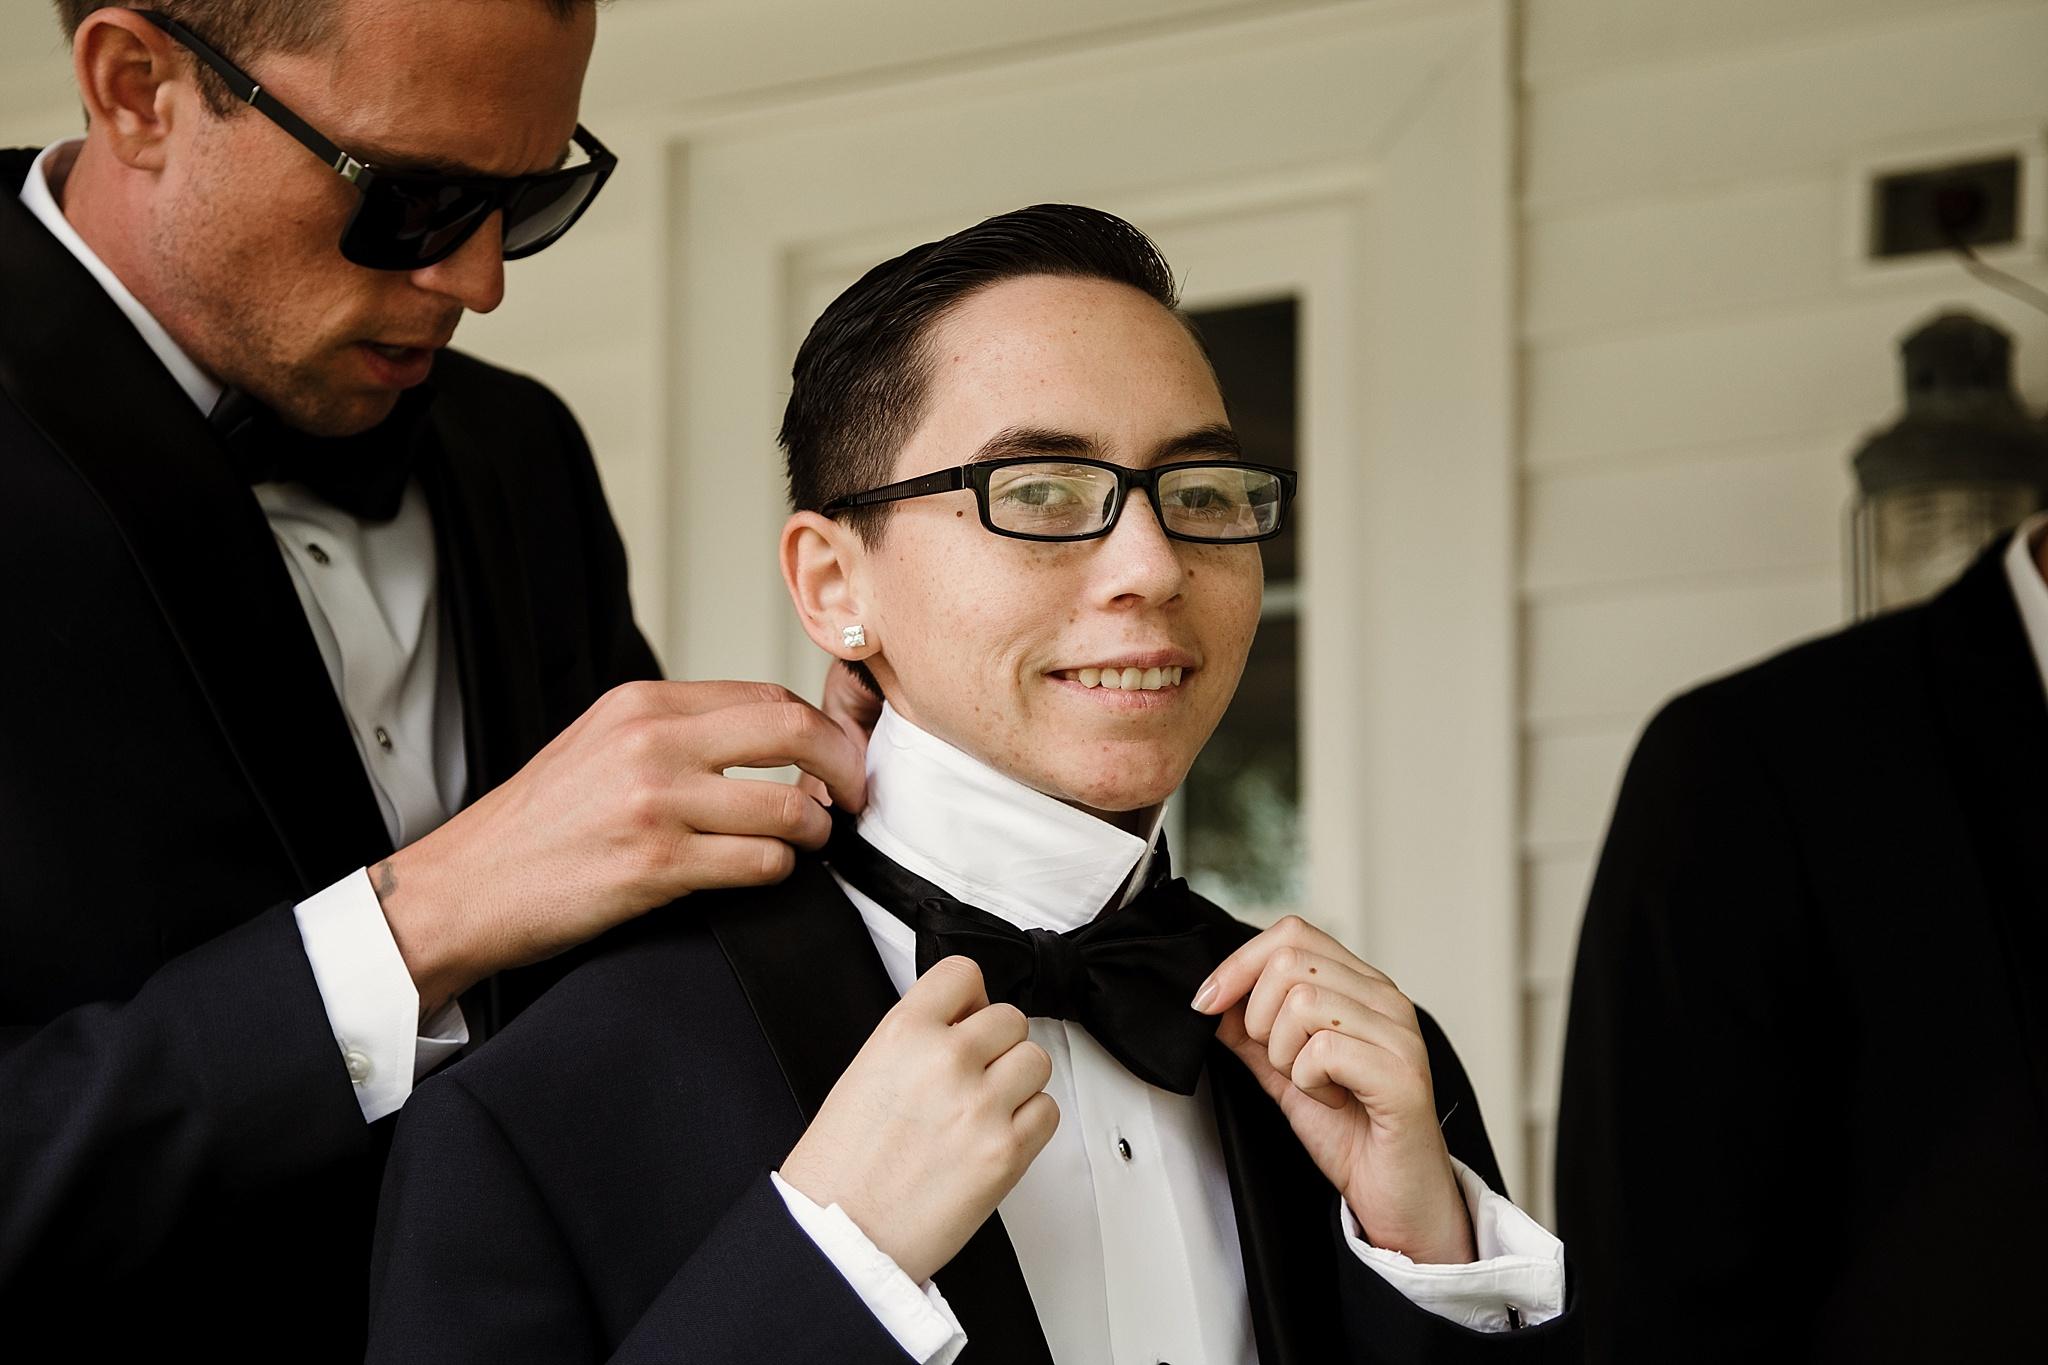 hudson_valley_wedding_0047.jpg